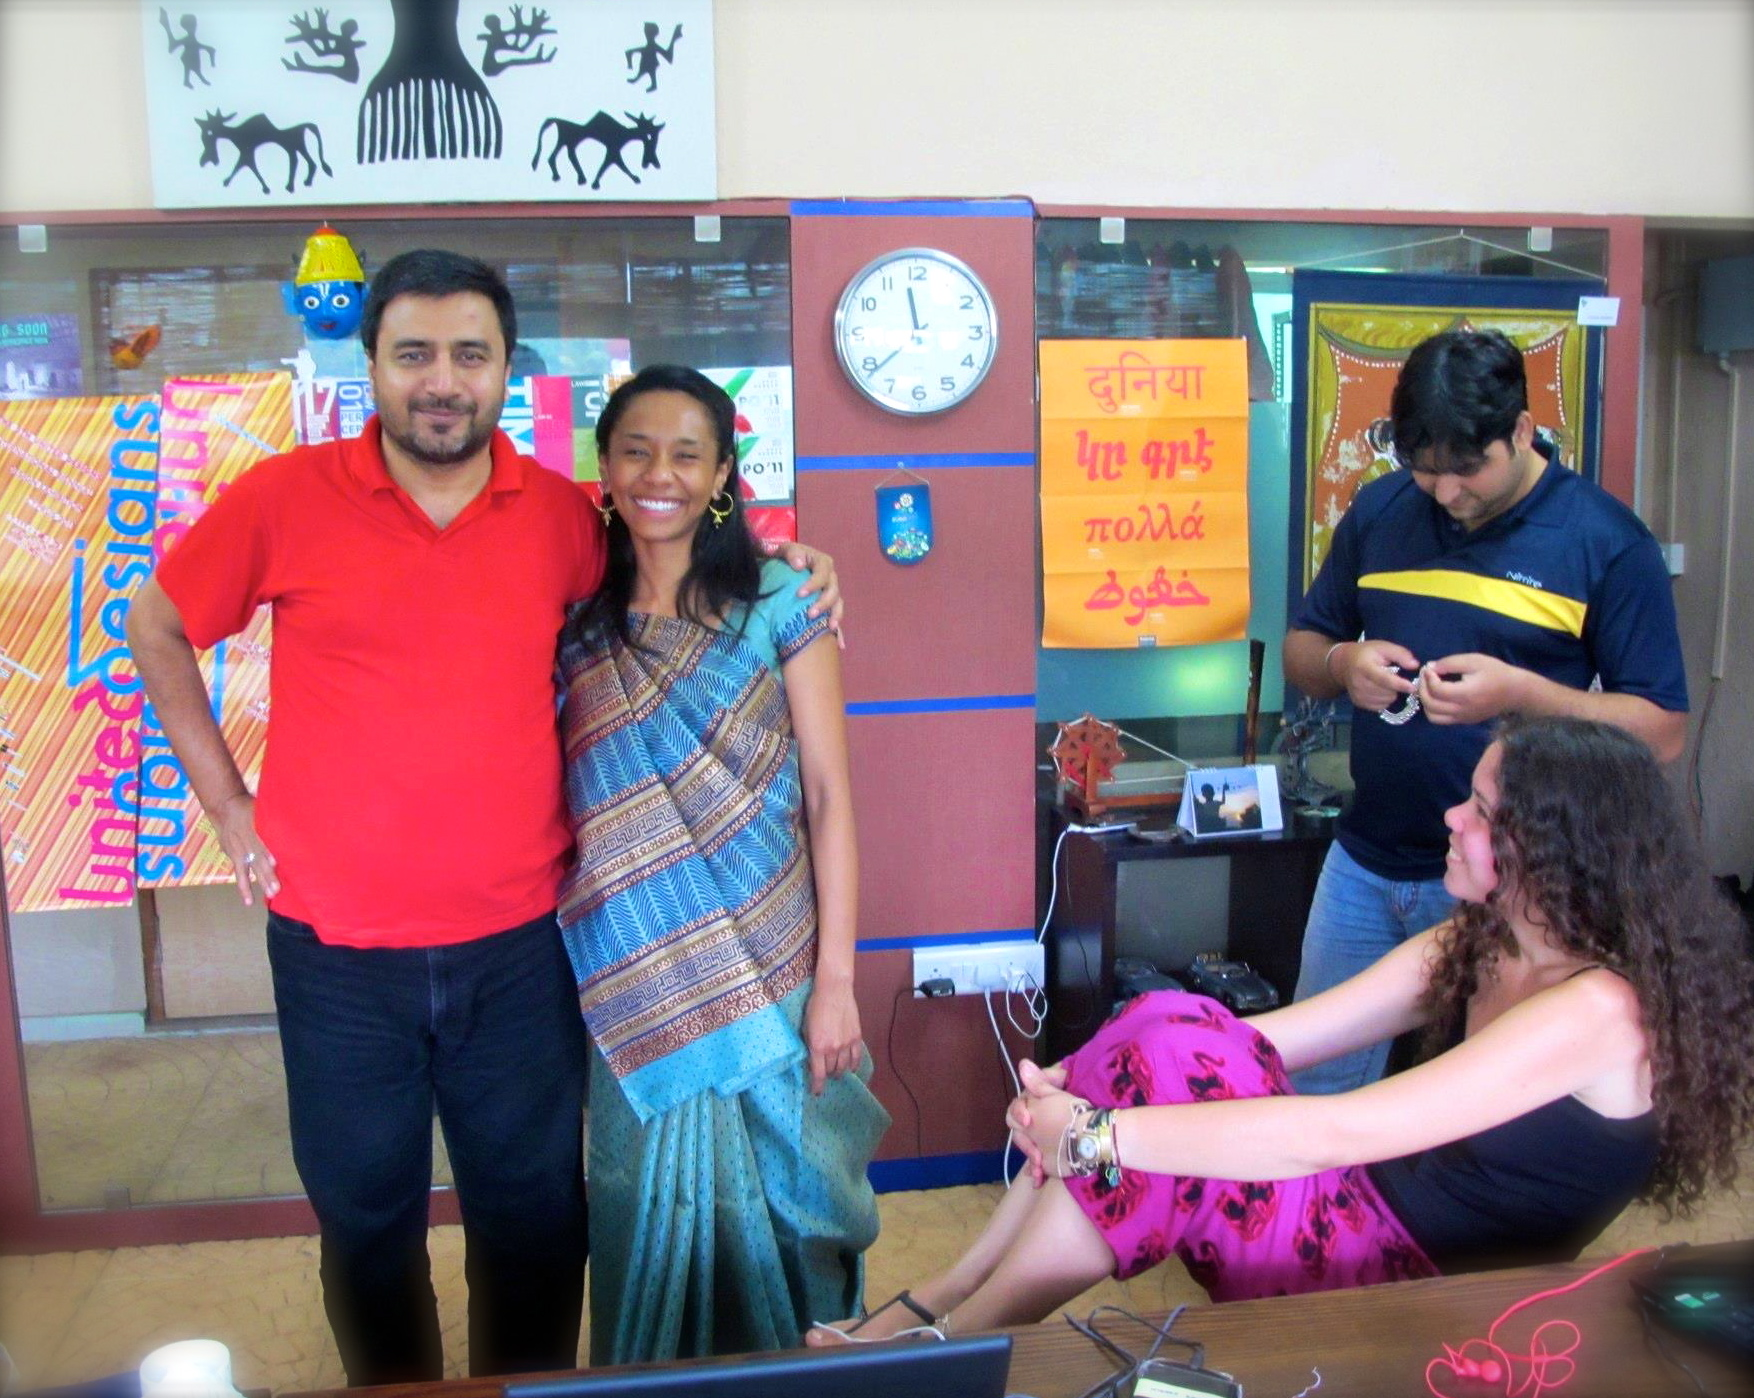 Sudhir with Pauline